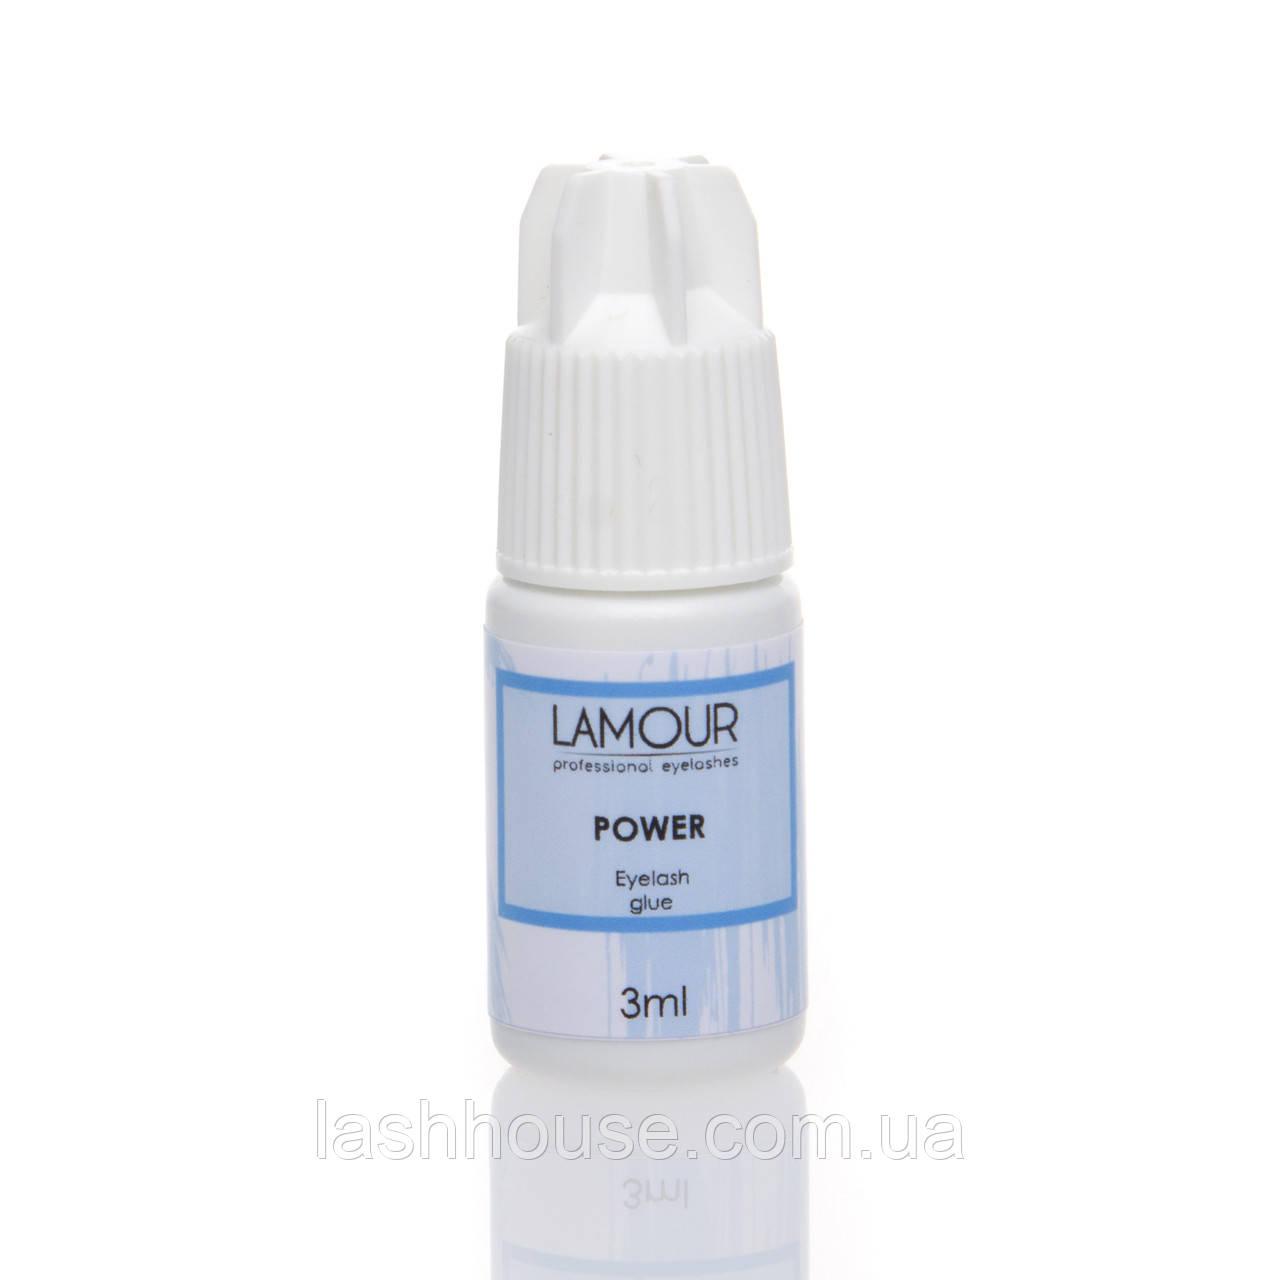 Клей для ресниц Lamour «Power» 3 мл